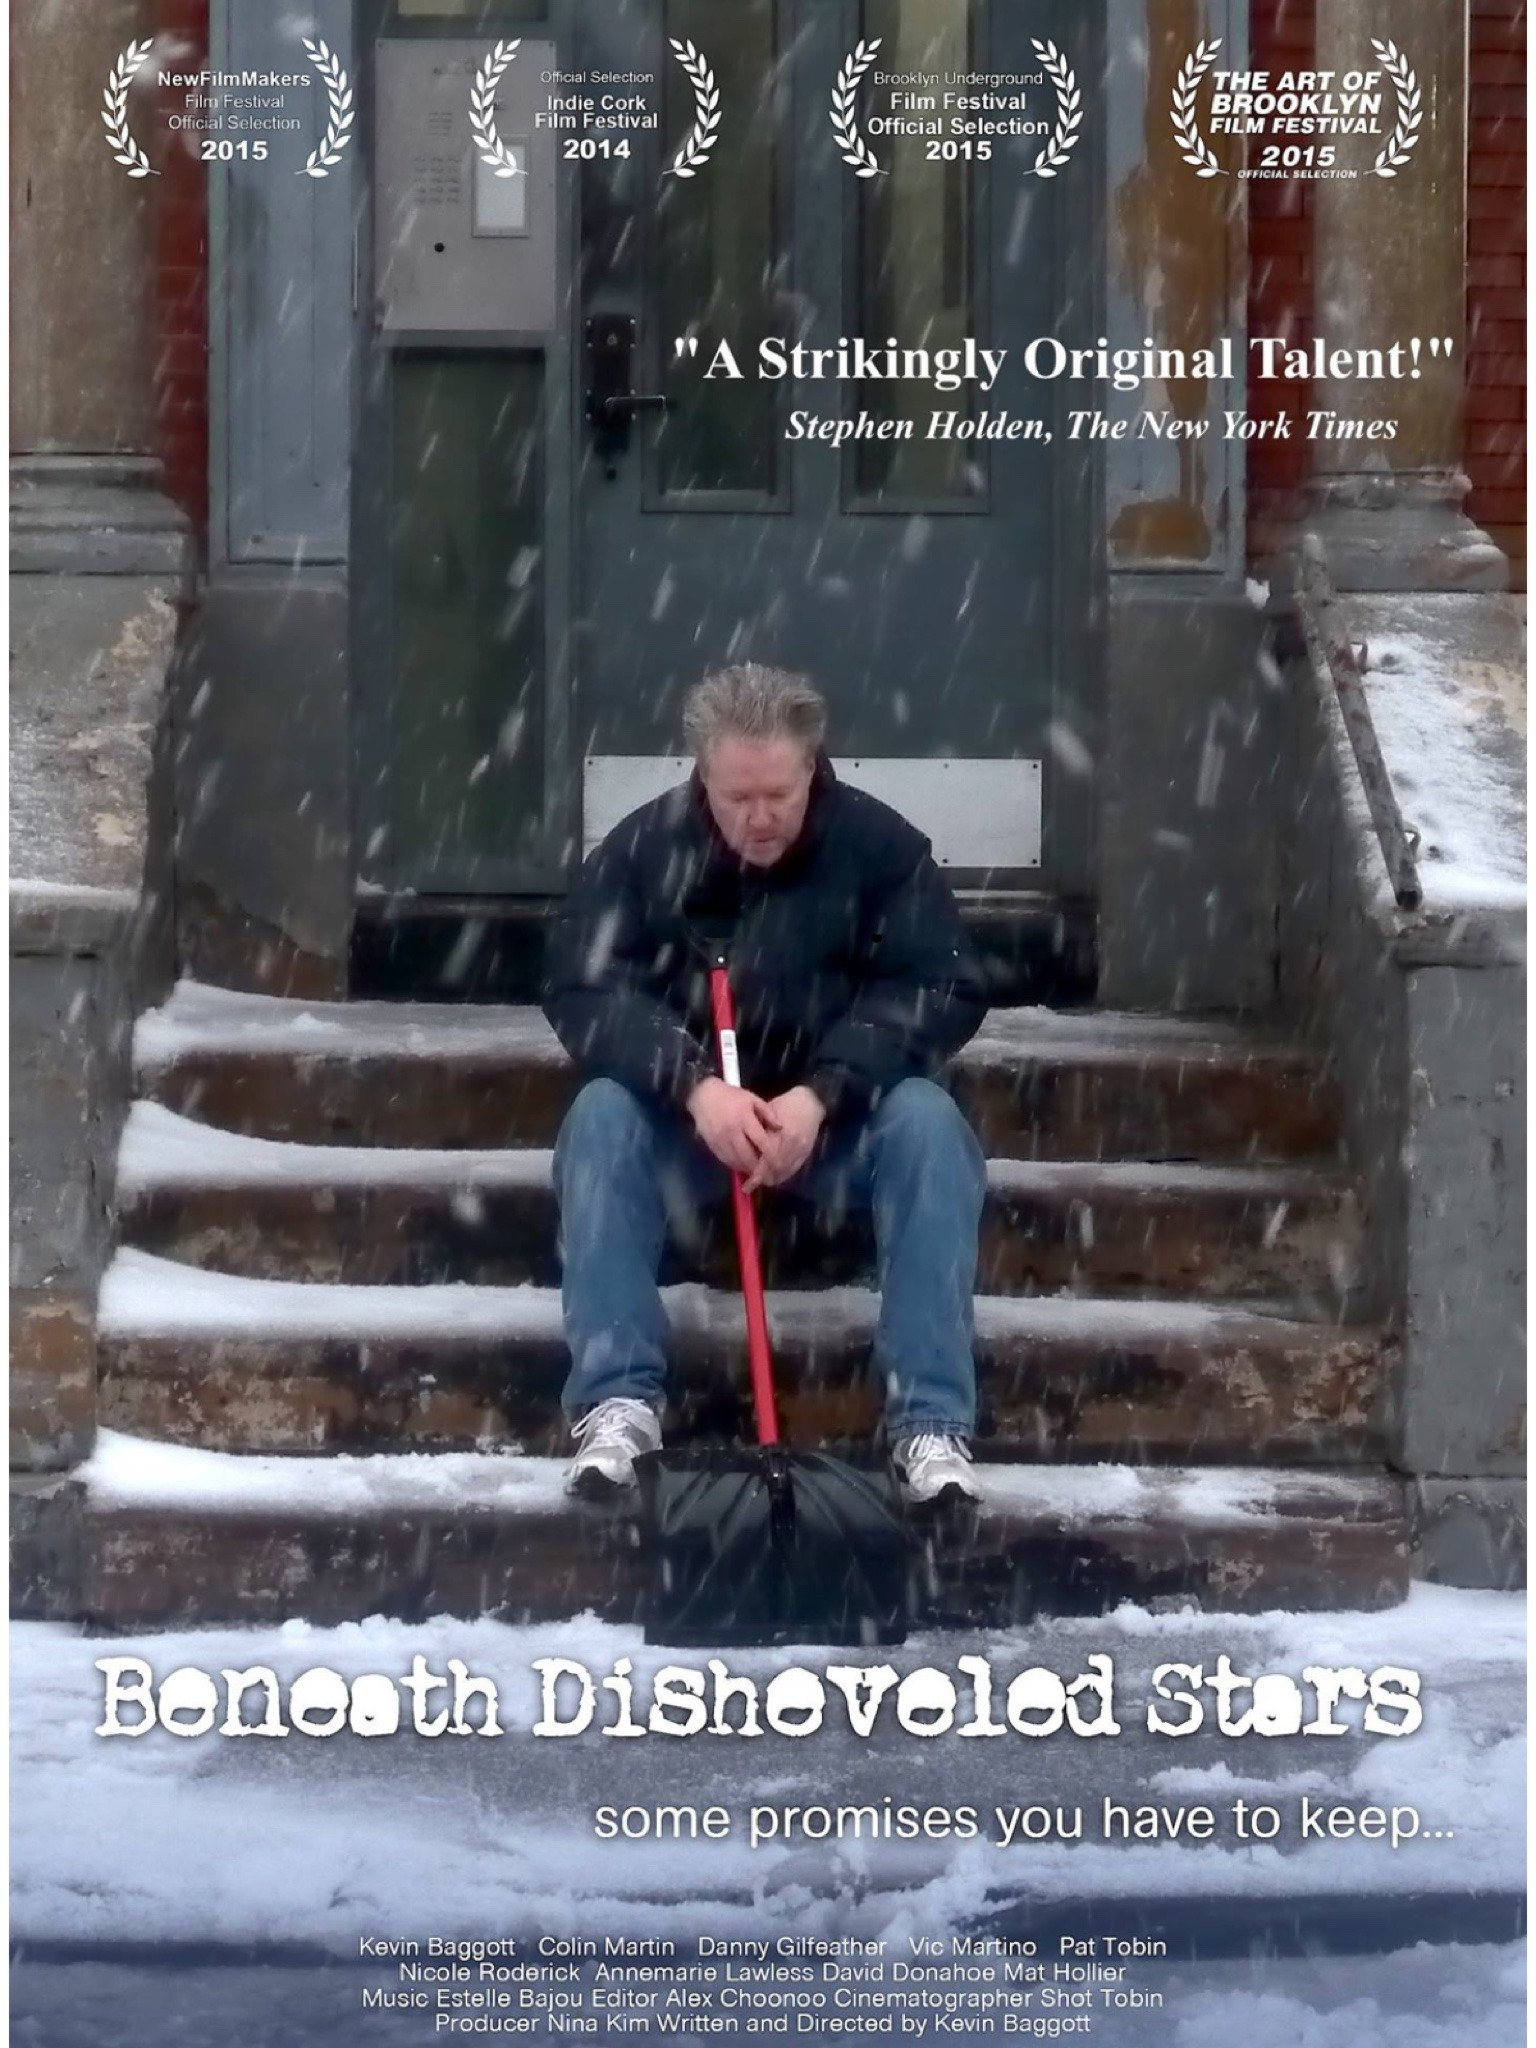 Beneath Disheveled Stars